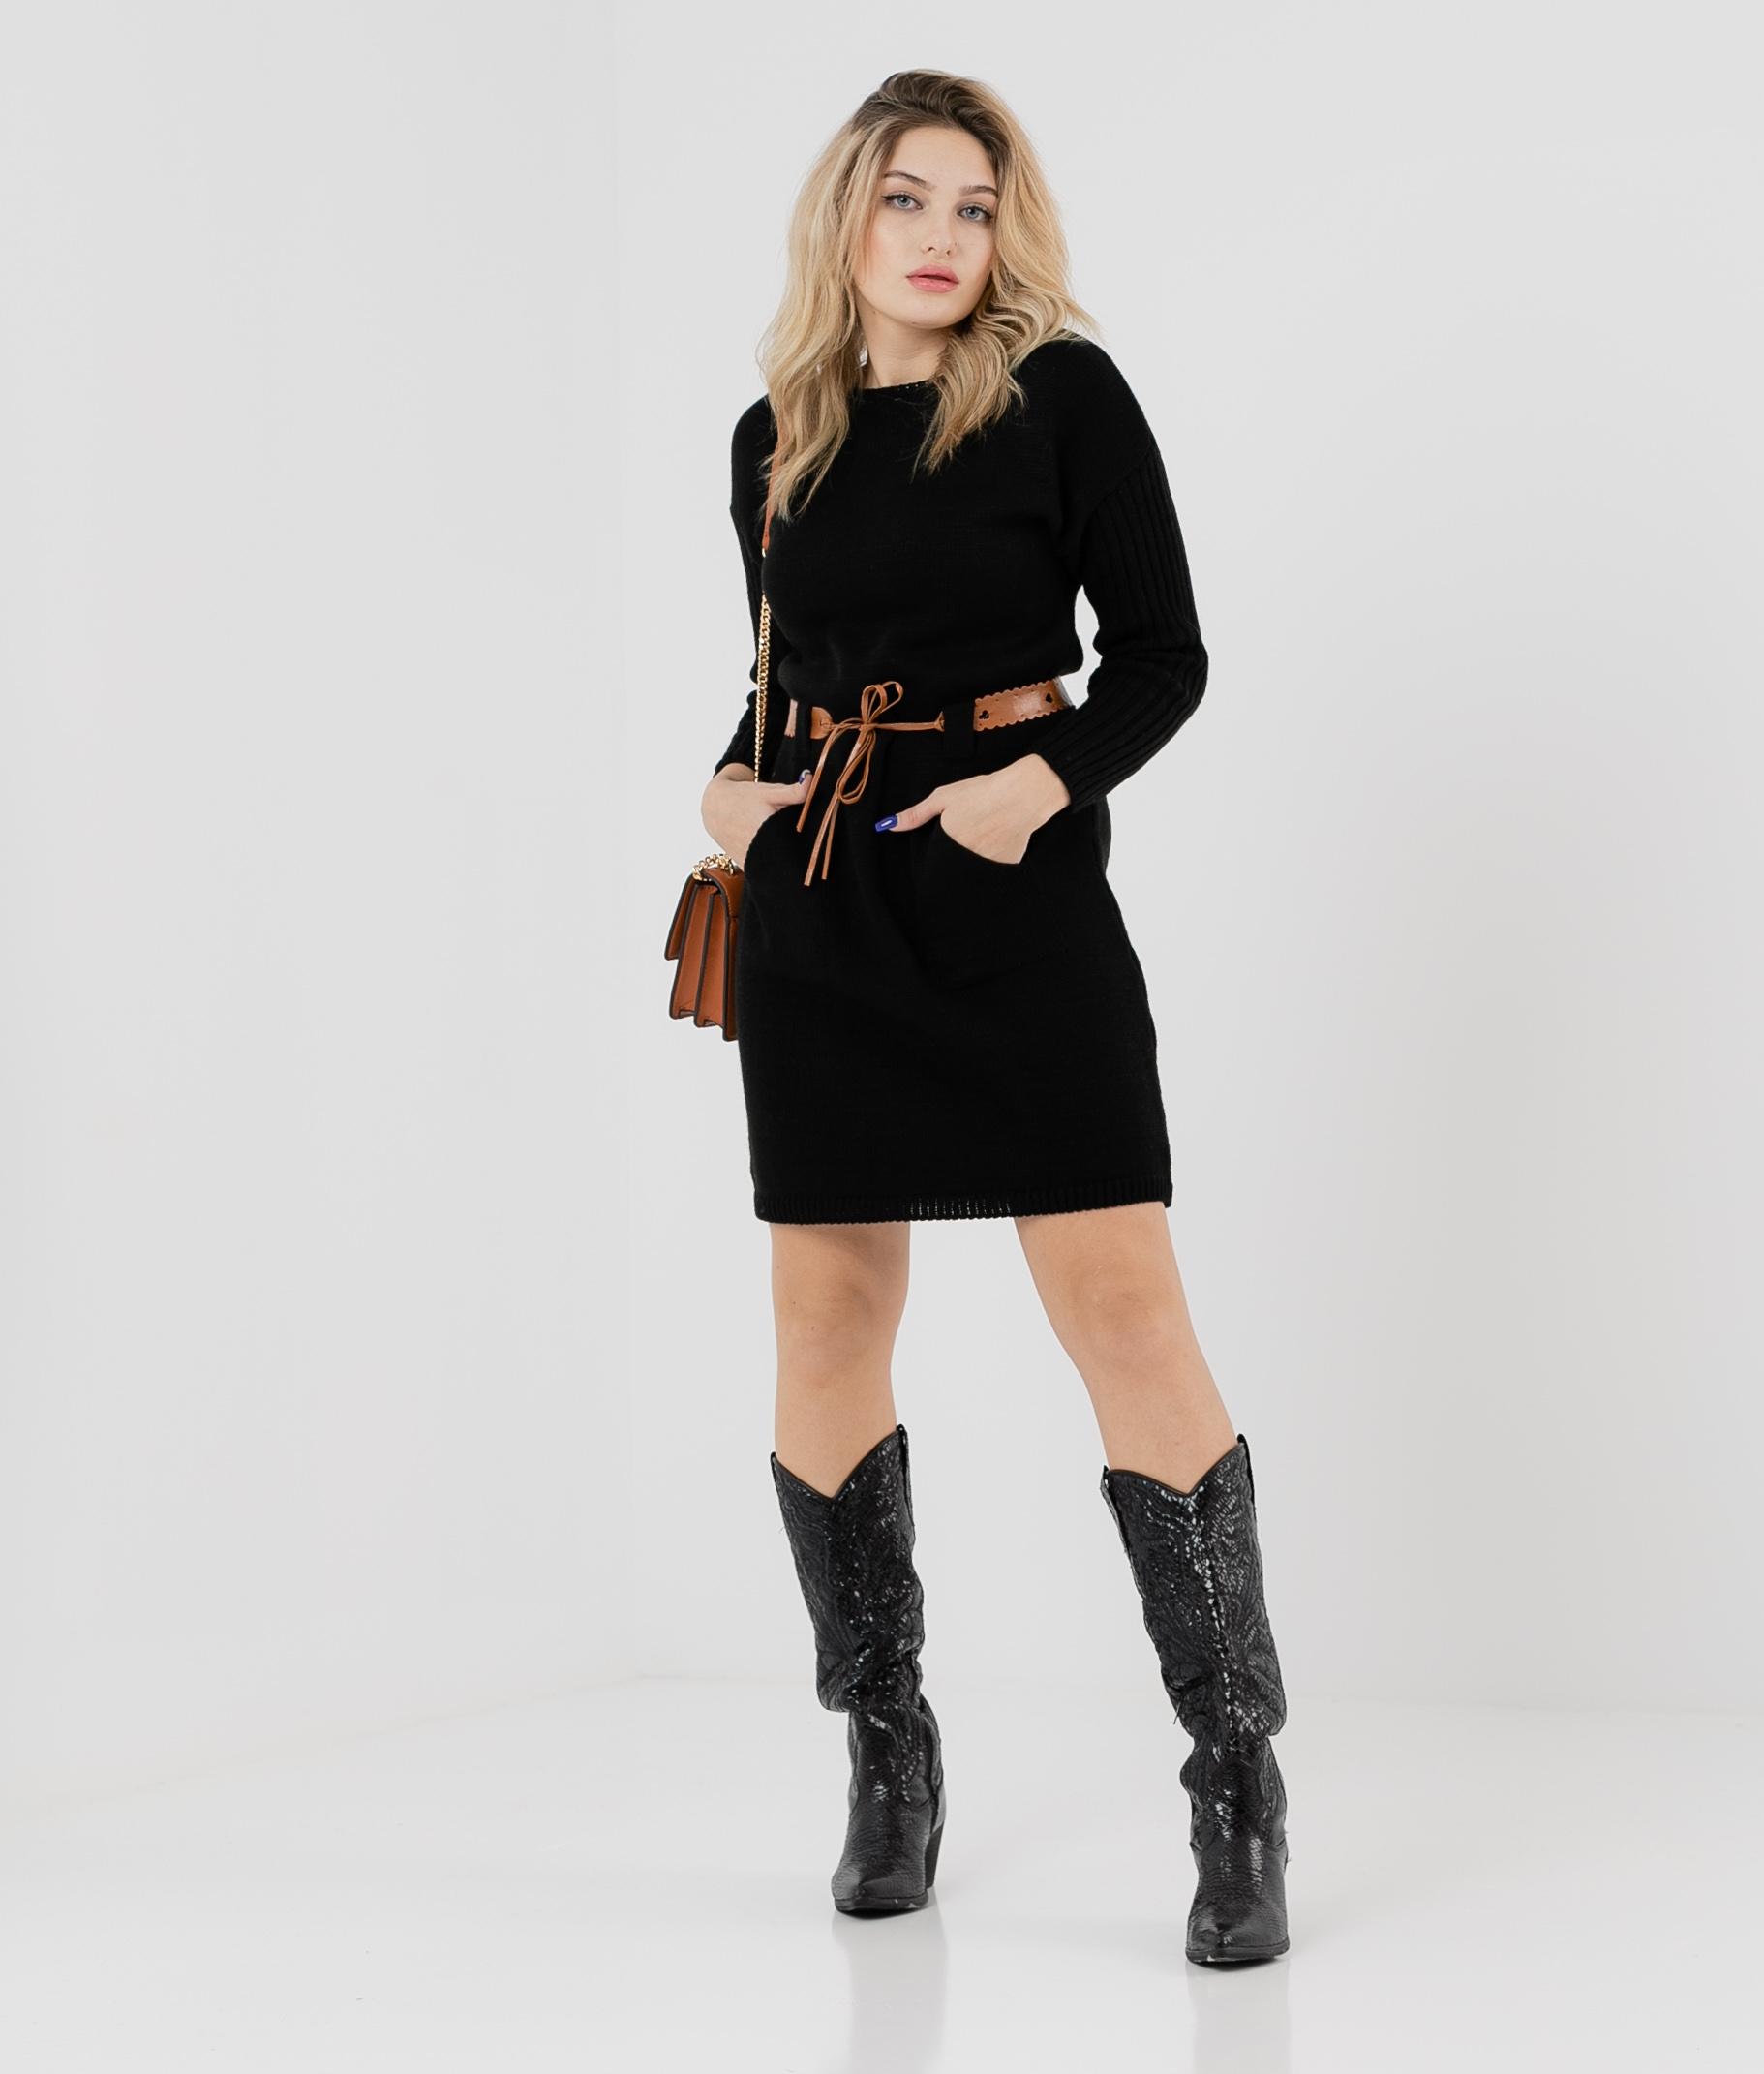 DRESS BUBI - BLACK